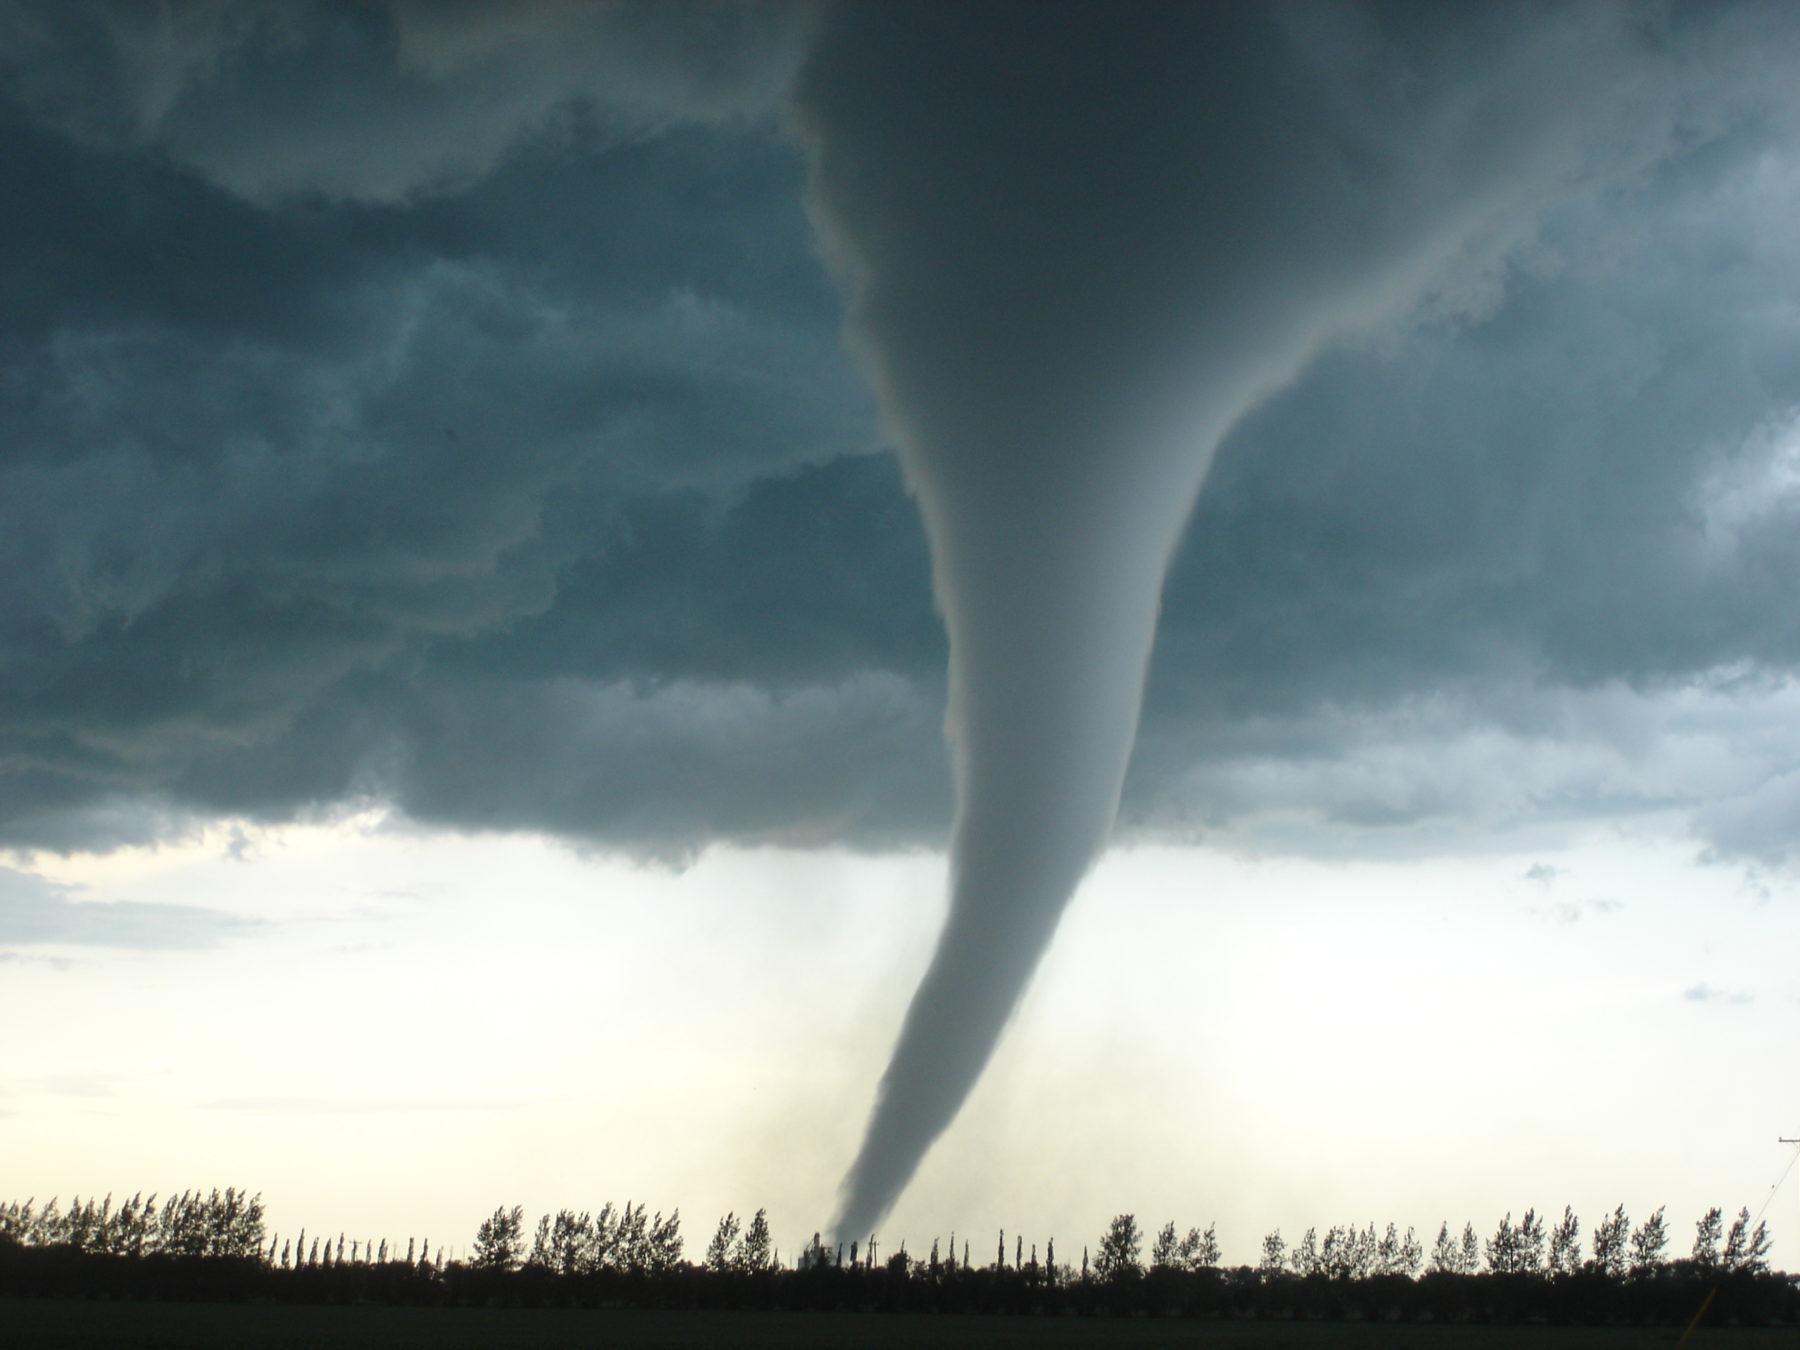 A destructive tornado in Alabama